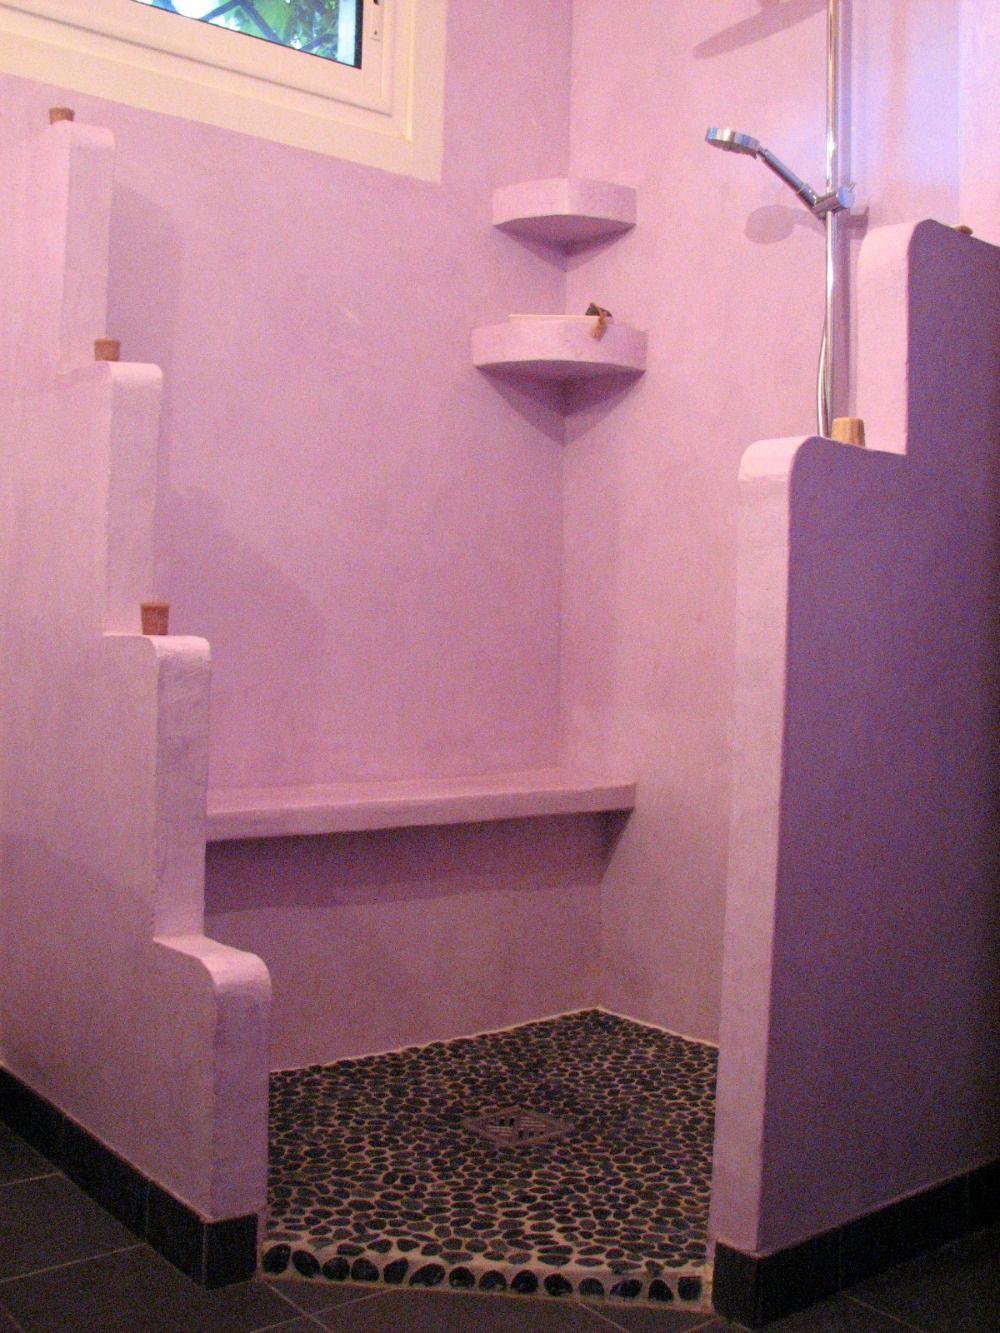 Décoration Salle de bain, espace douche en tadelakt marocain ...